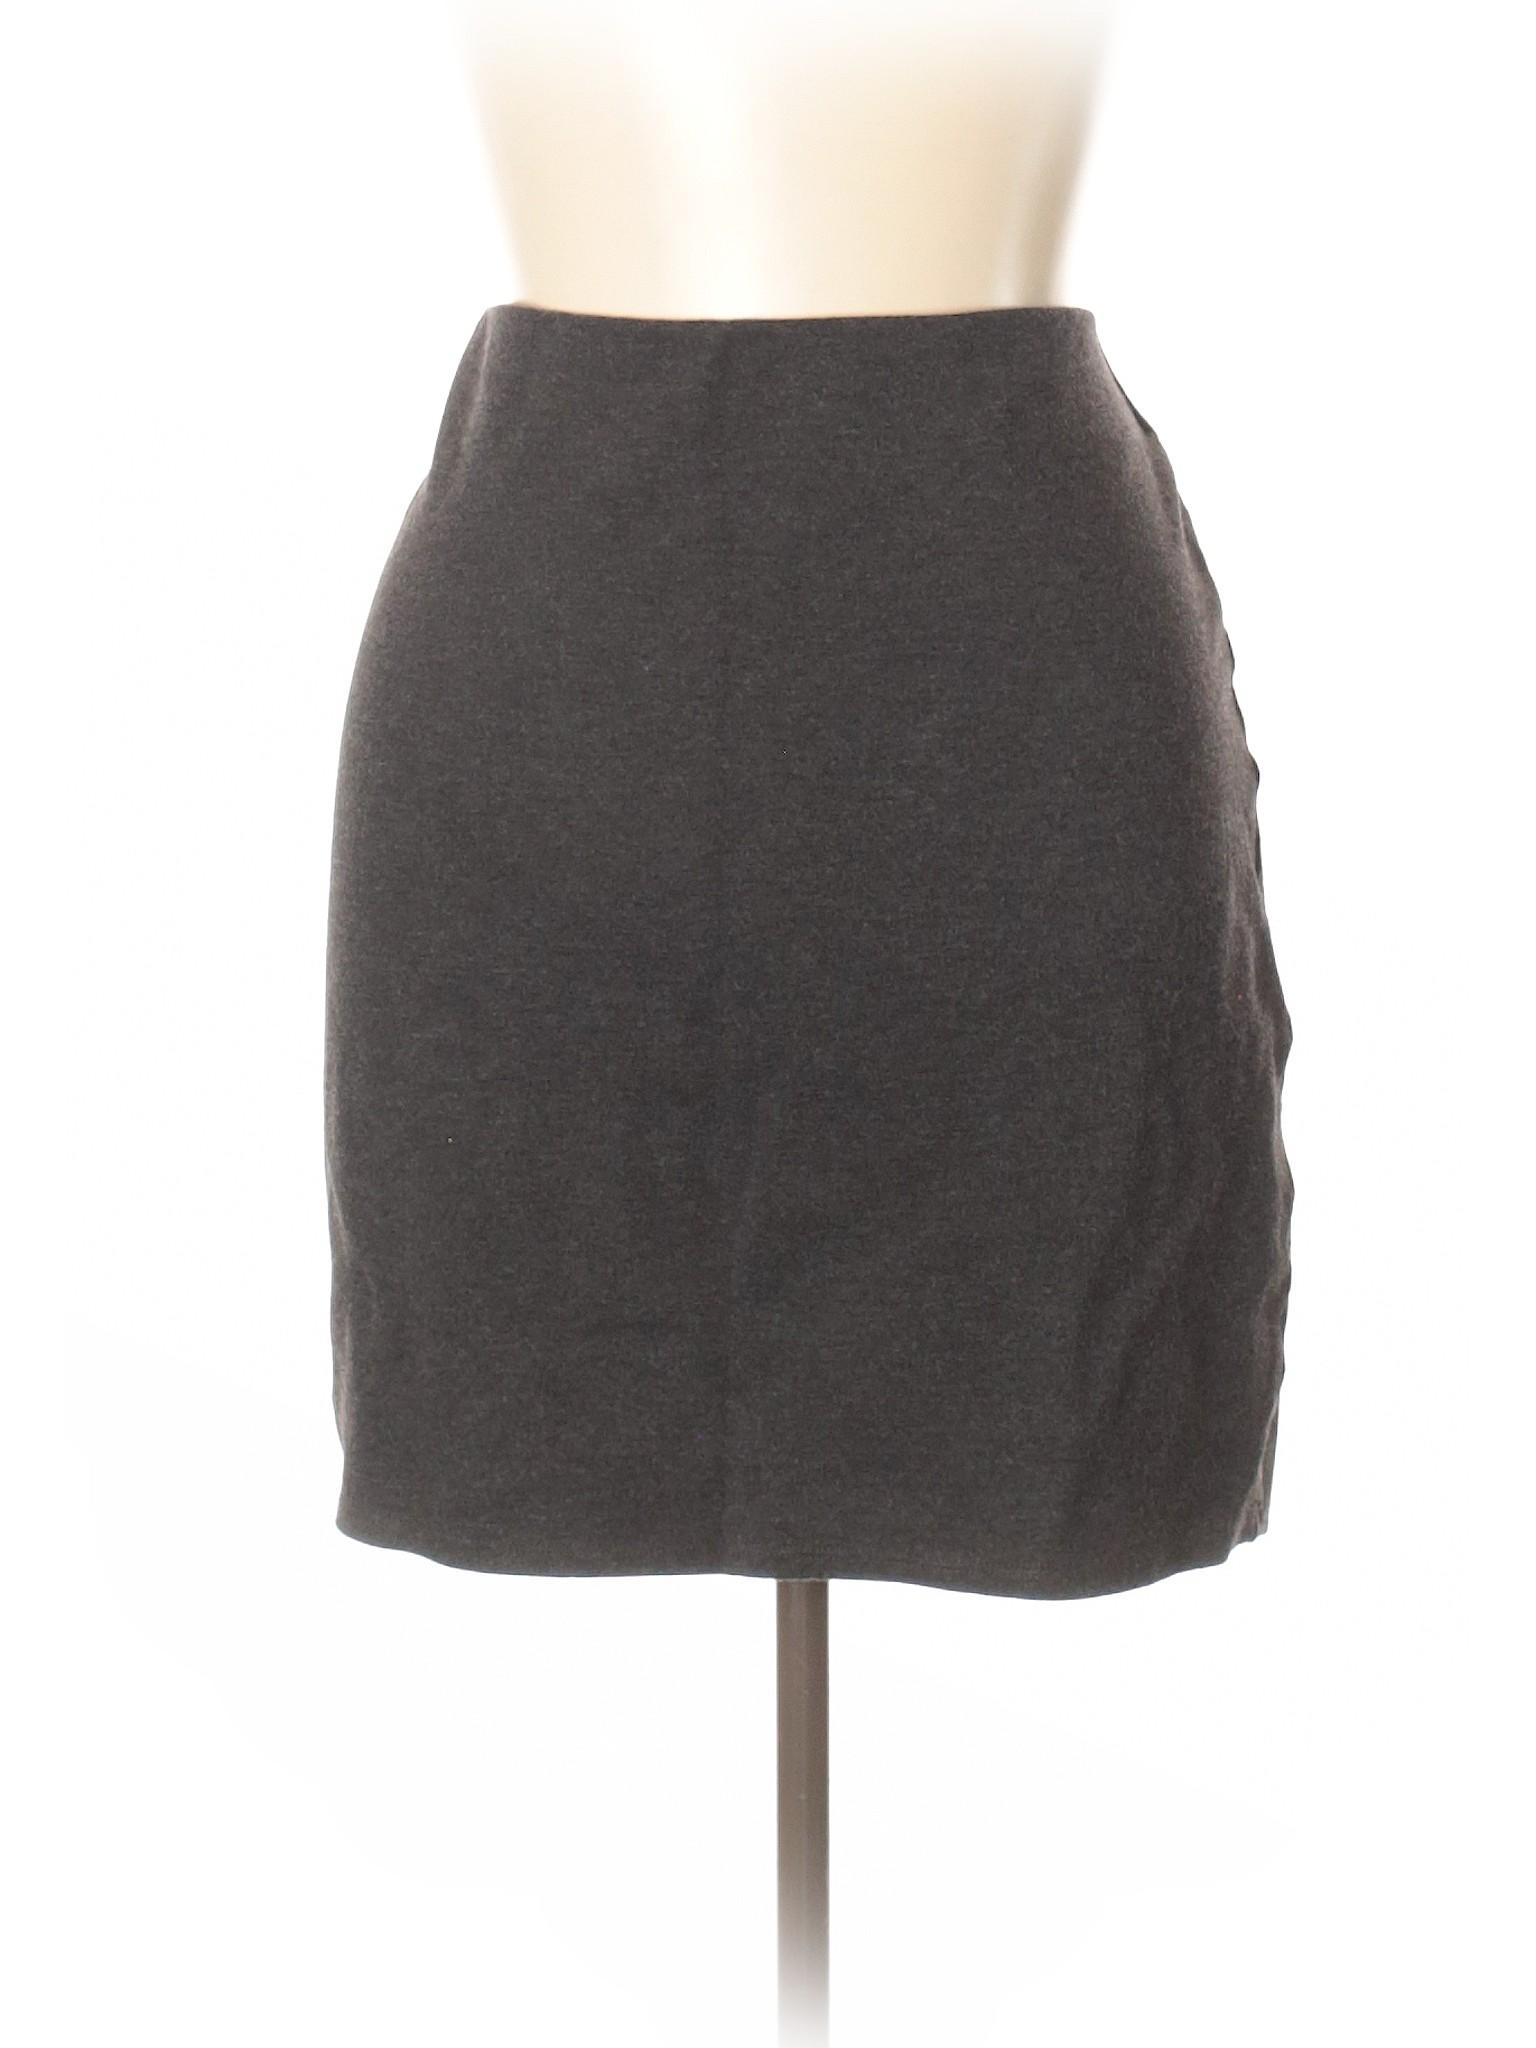 Casual Skirt Boutique Skirt Boutique Casual Boutique Skirt Boutique Casual xwOEIaIHq